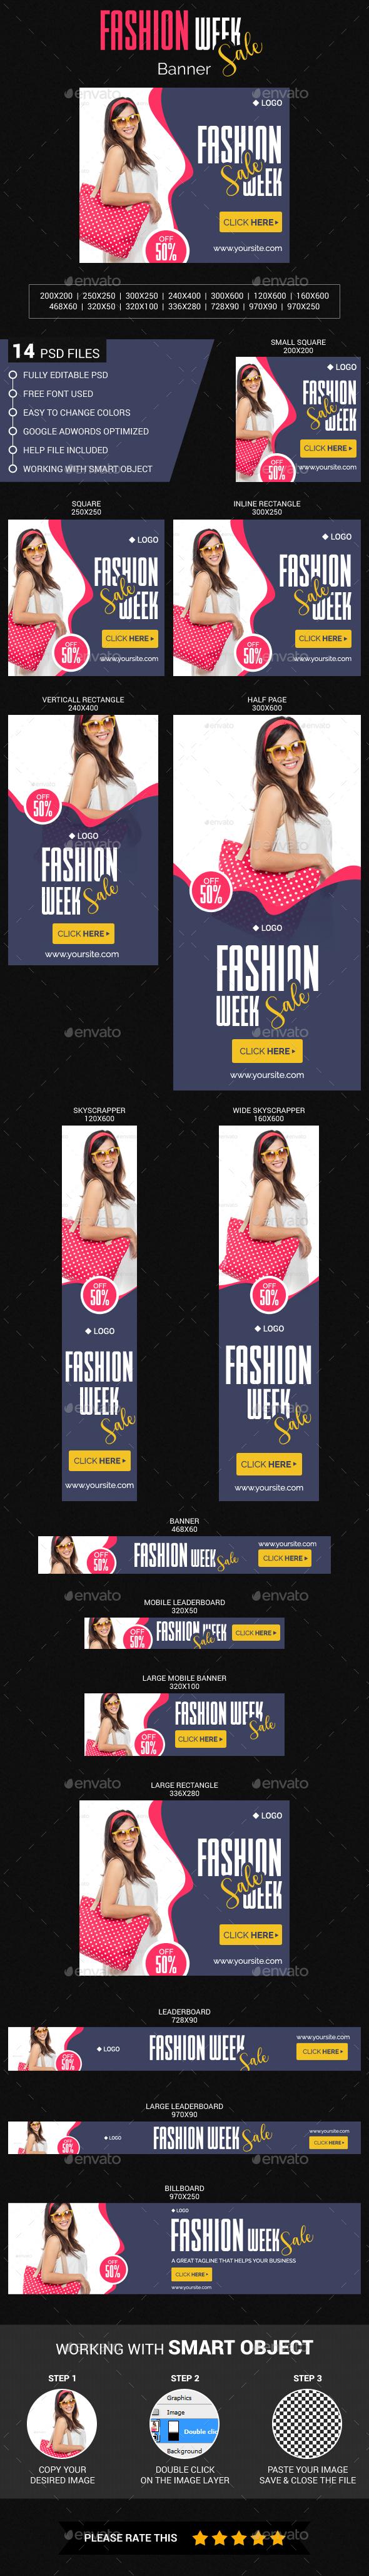 Fashion Week Sale - Banners & Ads Web Elements